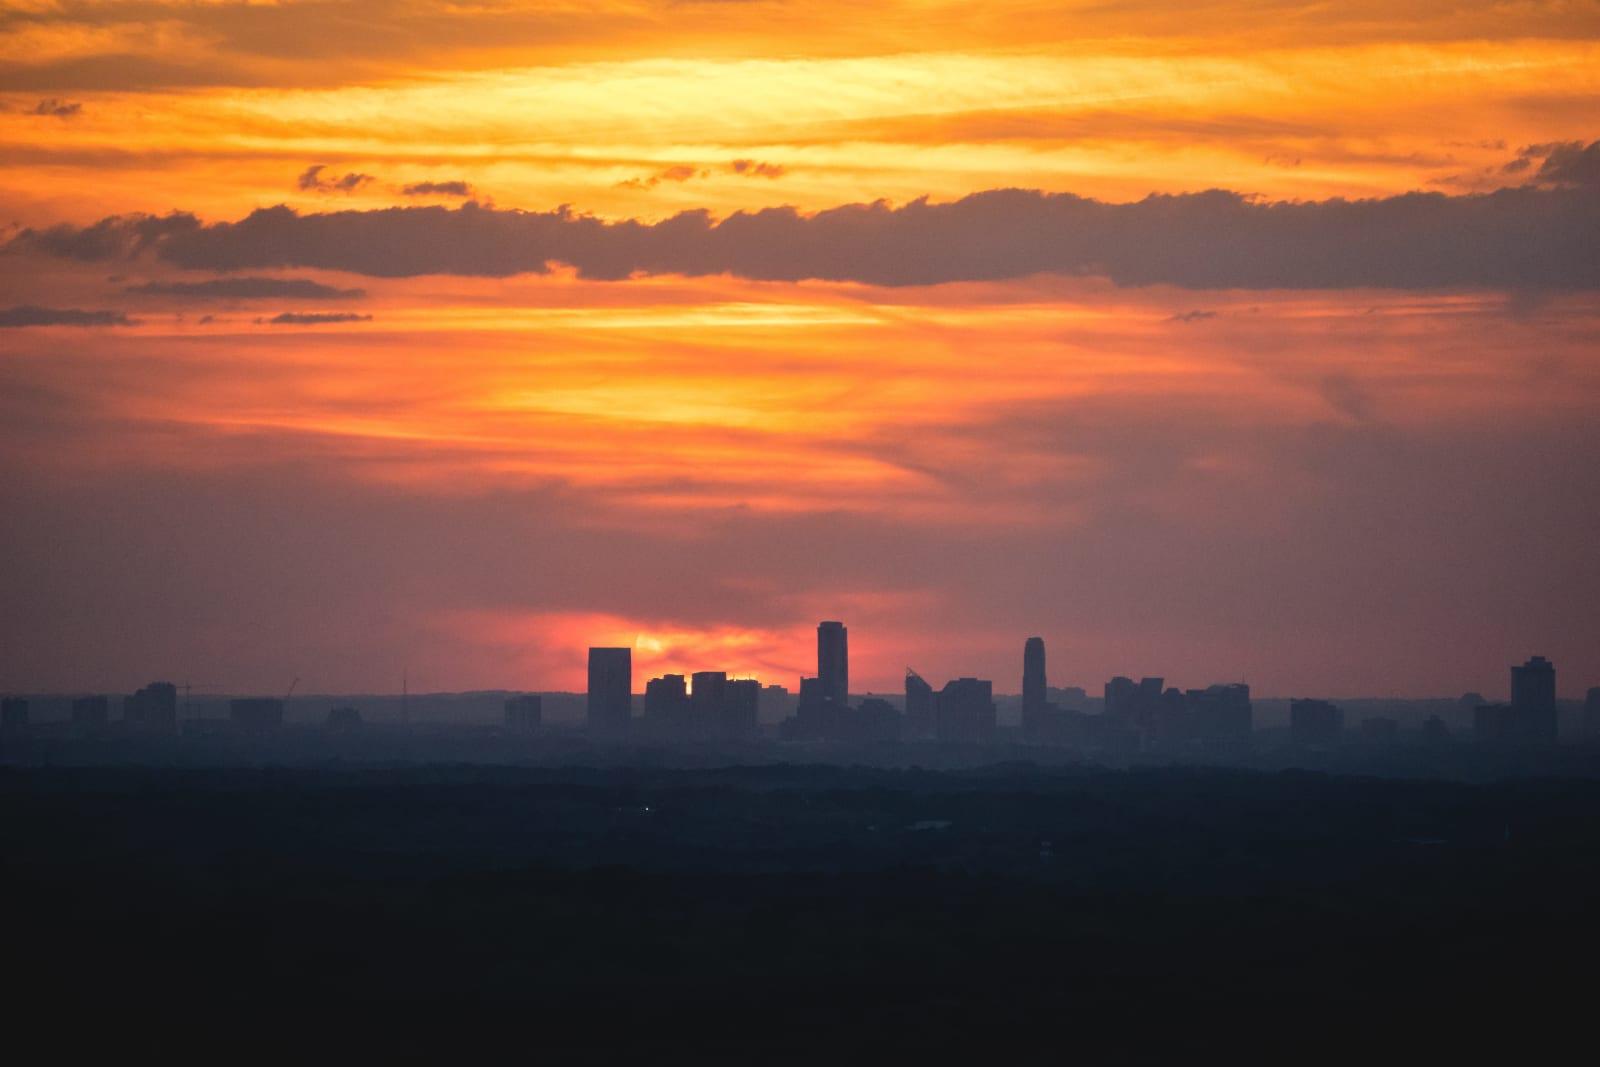 Sunset behind the Buckhead Skyline